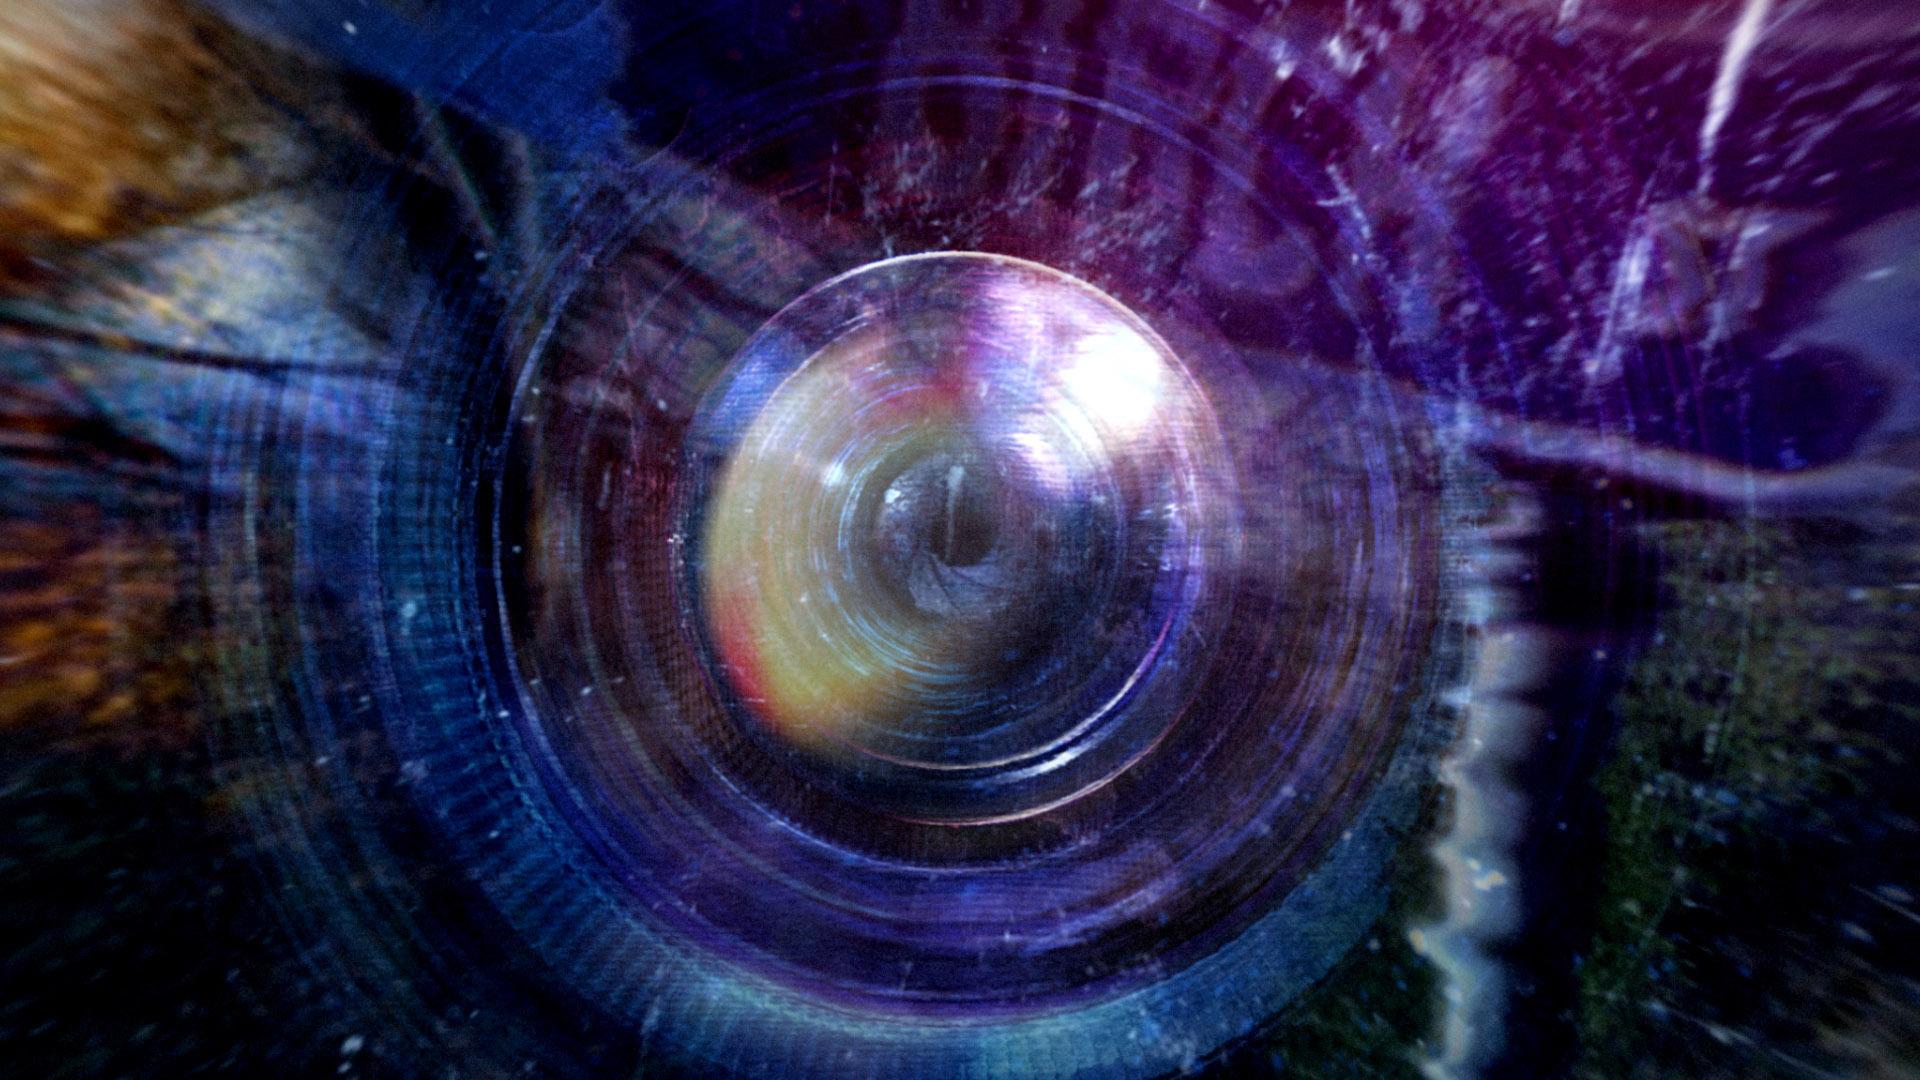 AKA_Teaser_Dreams_Texted_PreLaunch_Stereo_ProResHQ (00303)_web.jpg